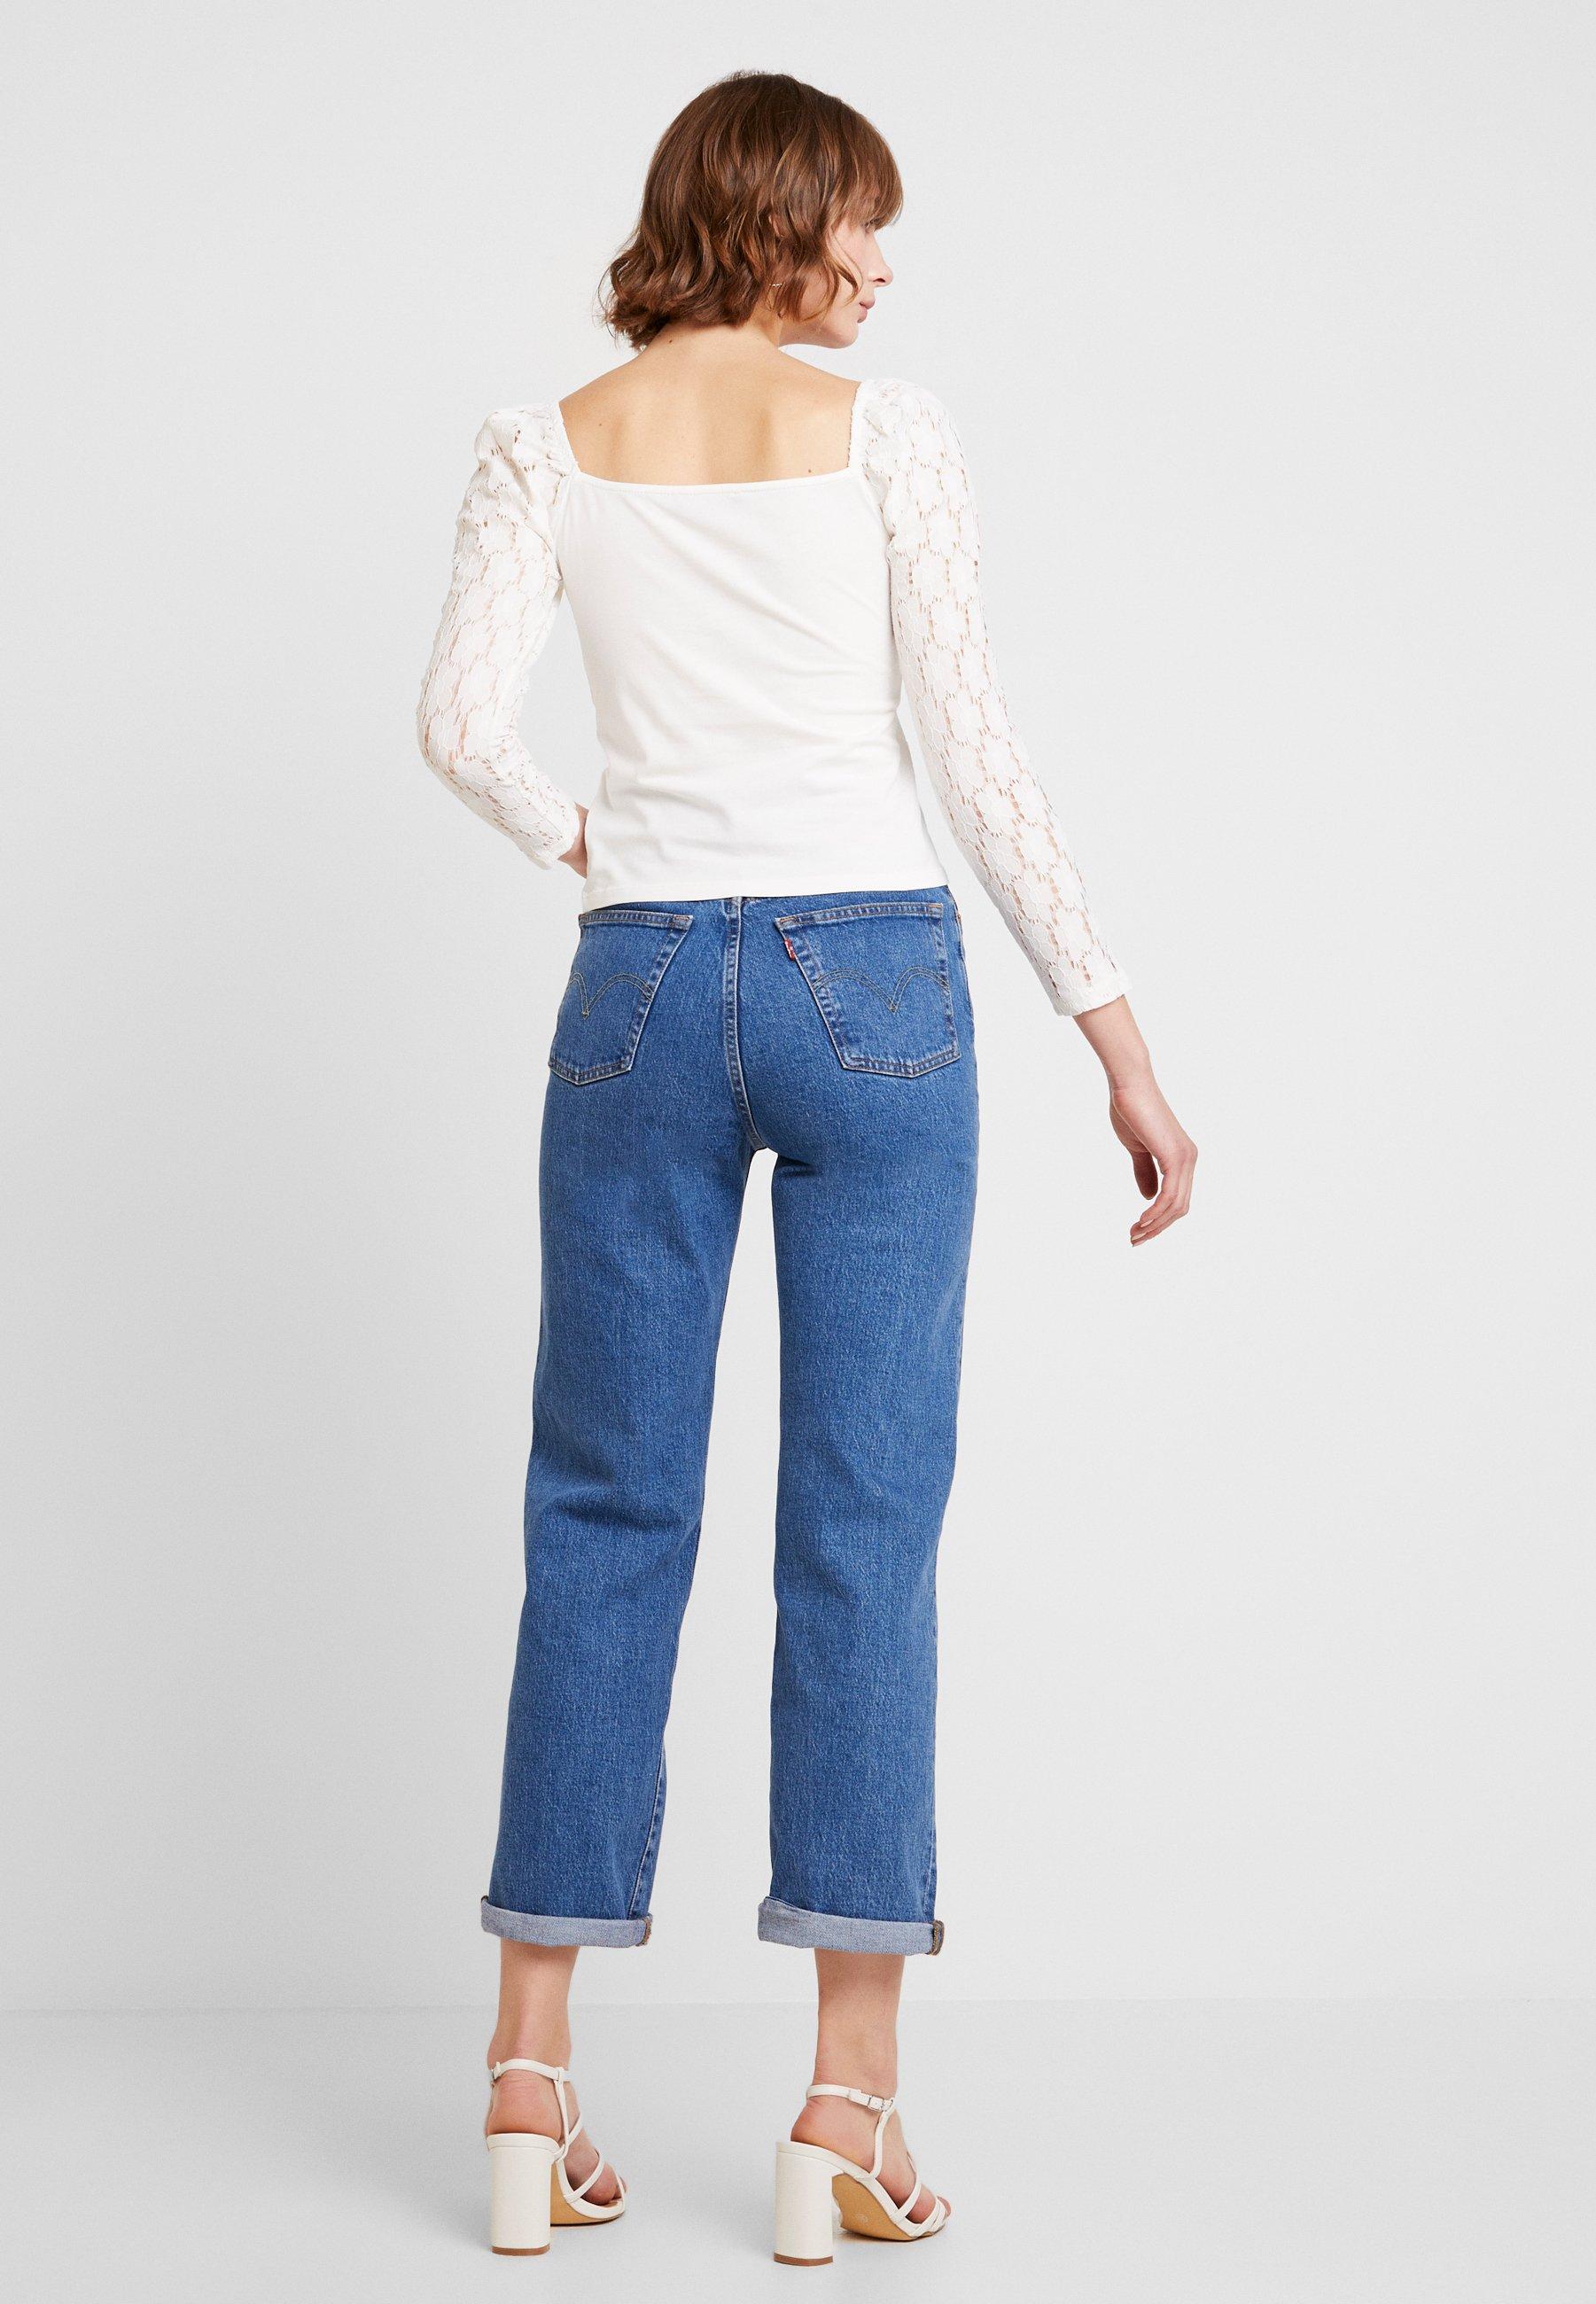 Stampa amp;odd Even shirt T White Con Nnv8Om0w